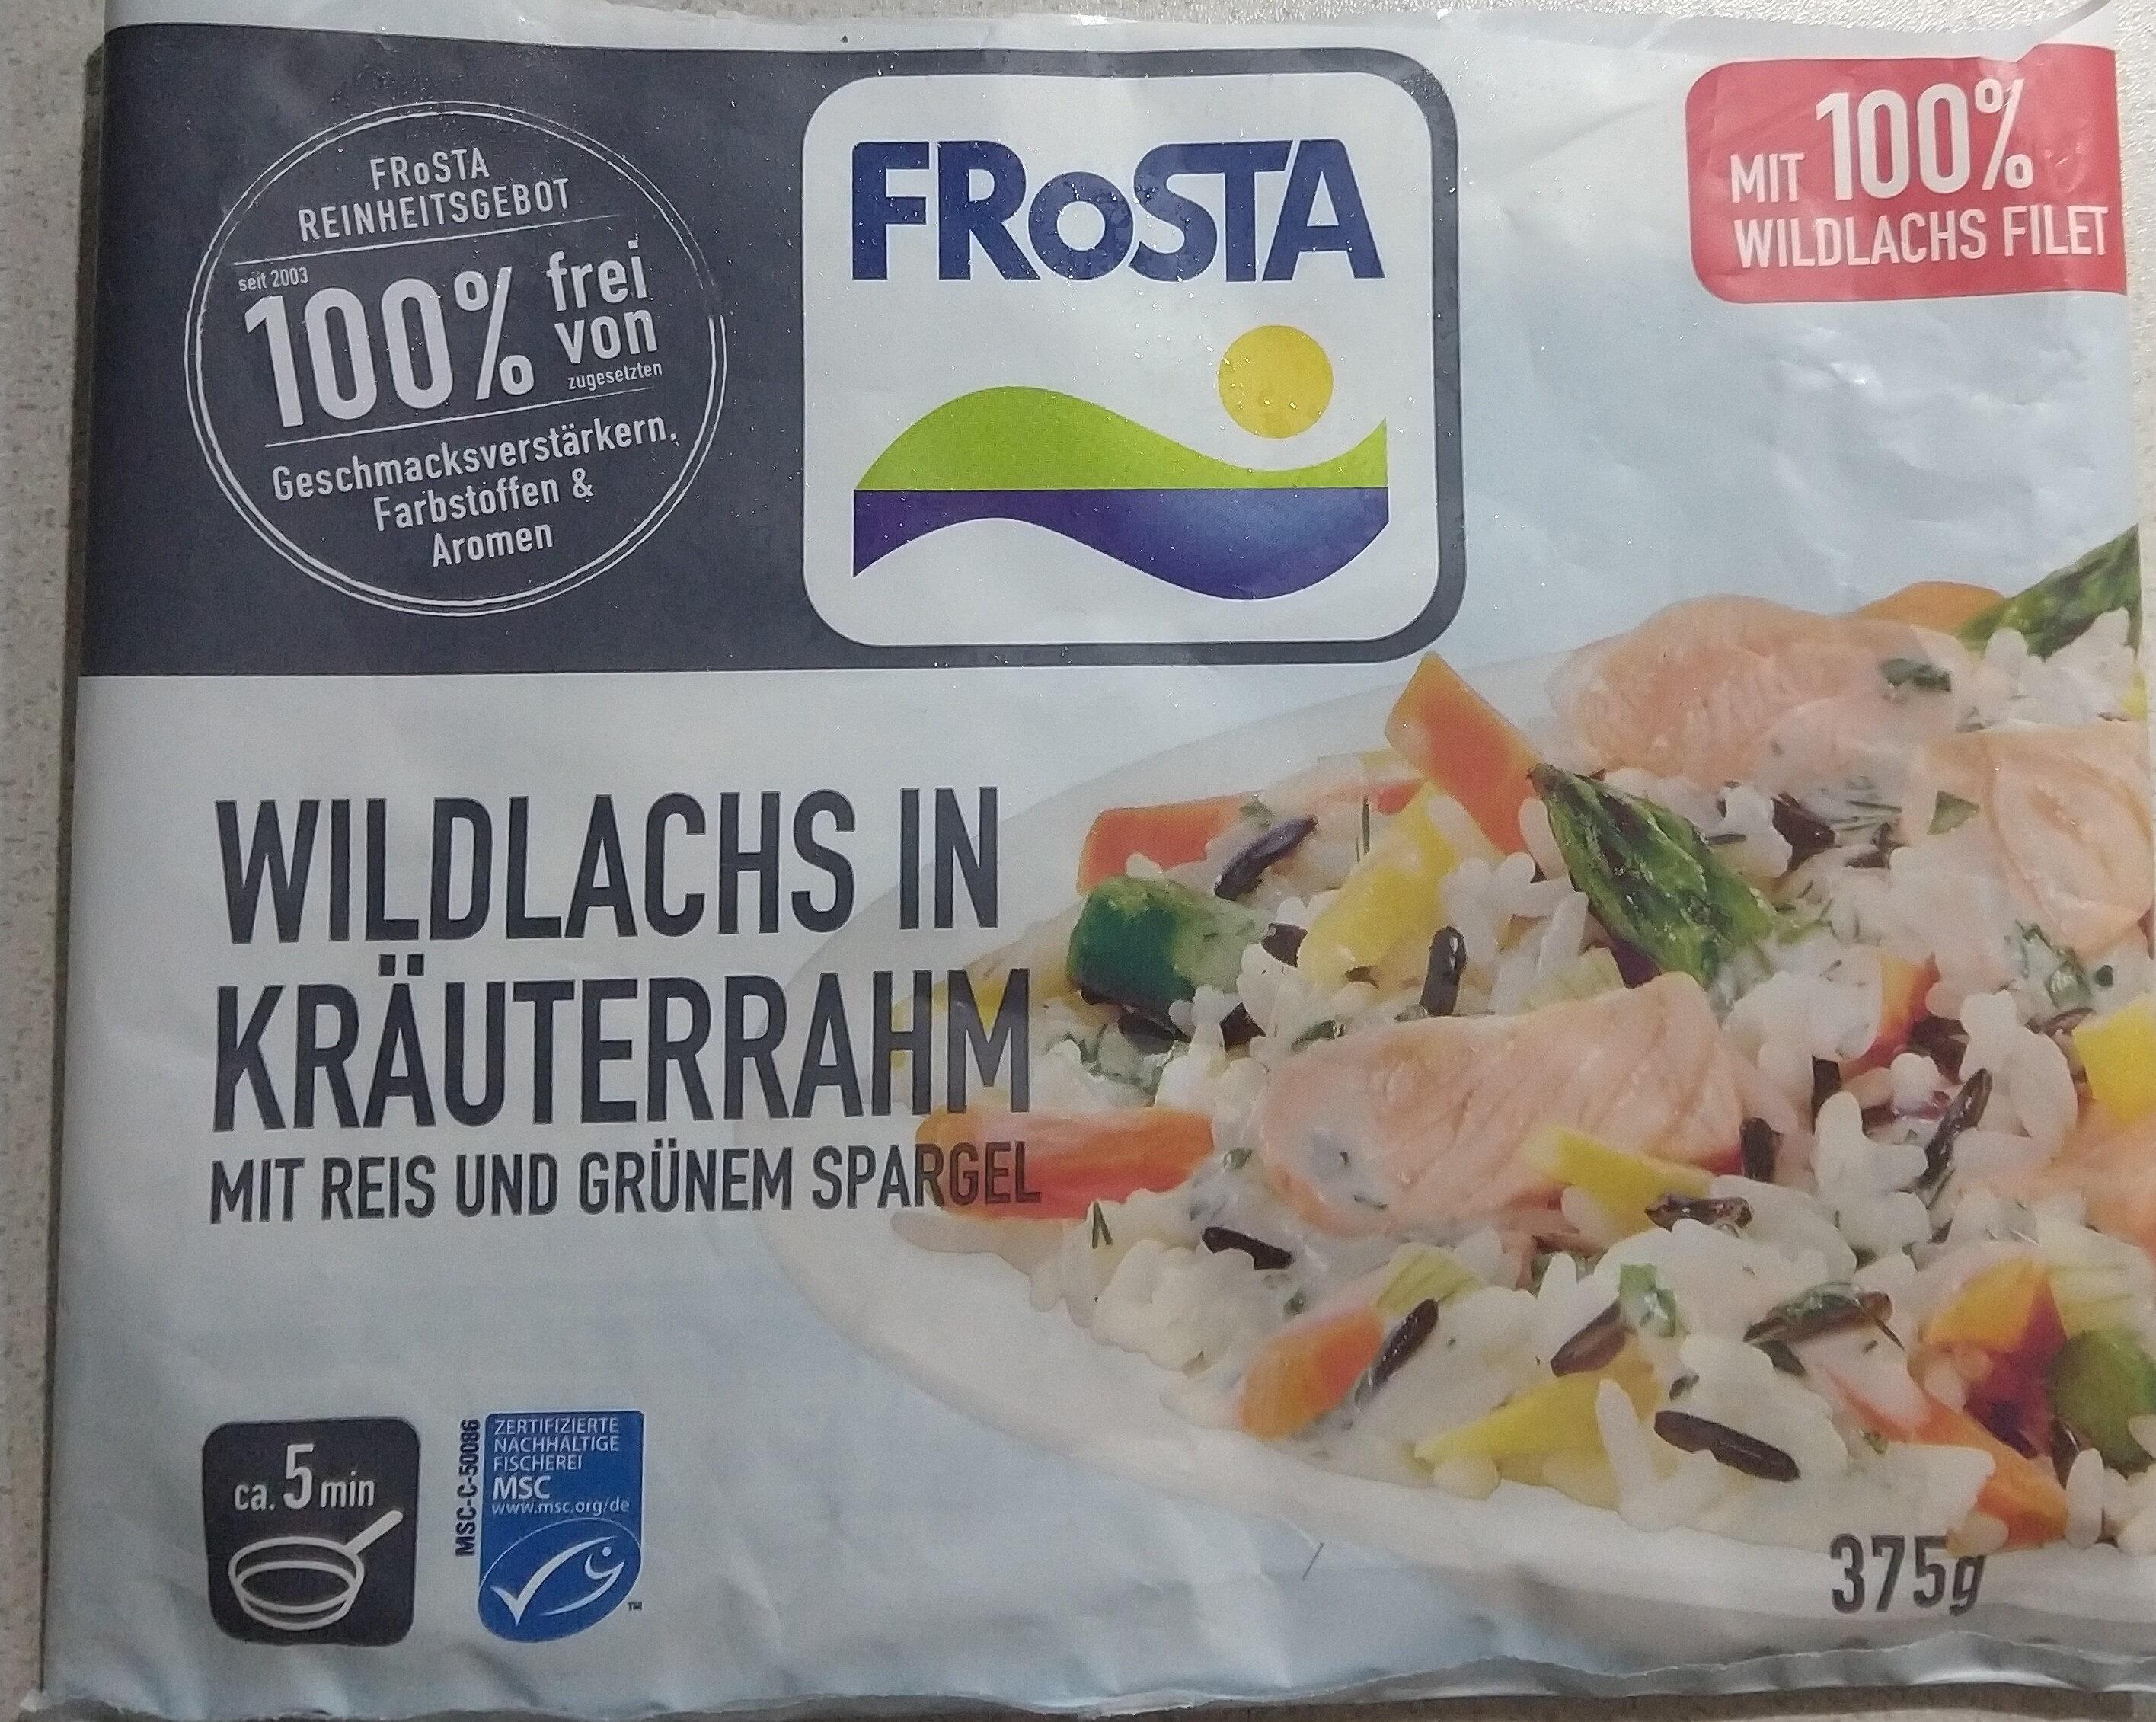 Frosta wildlachs in kräuterrahm - Product - de